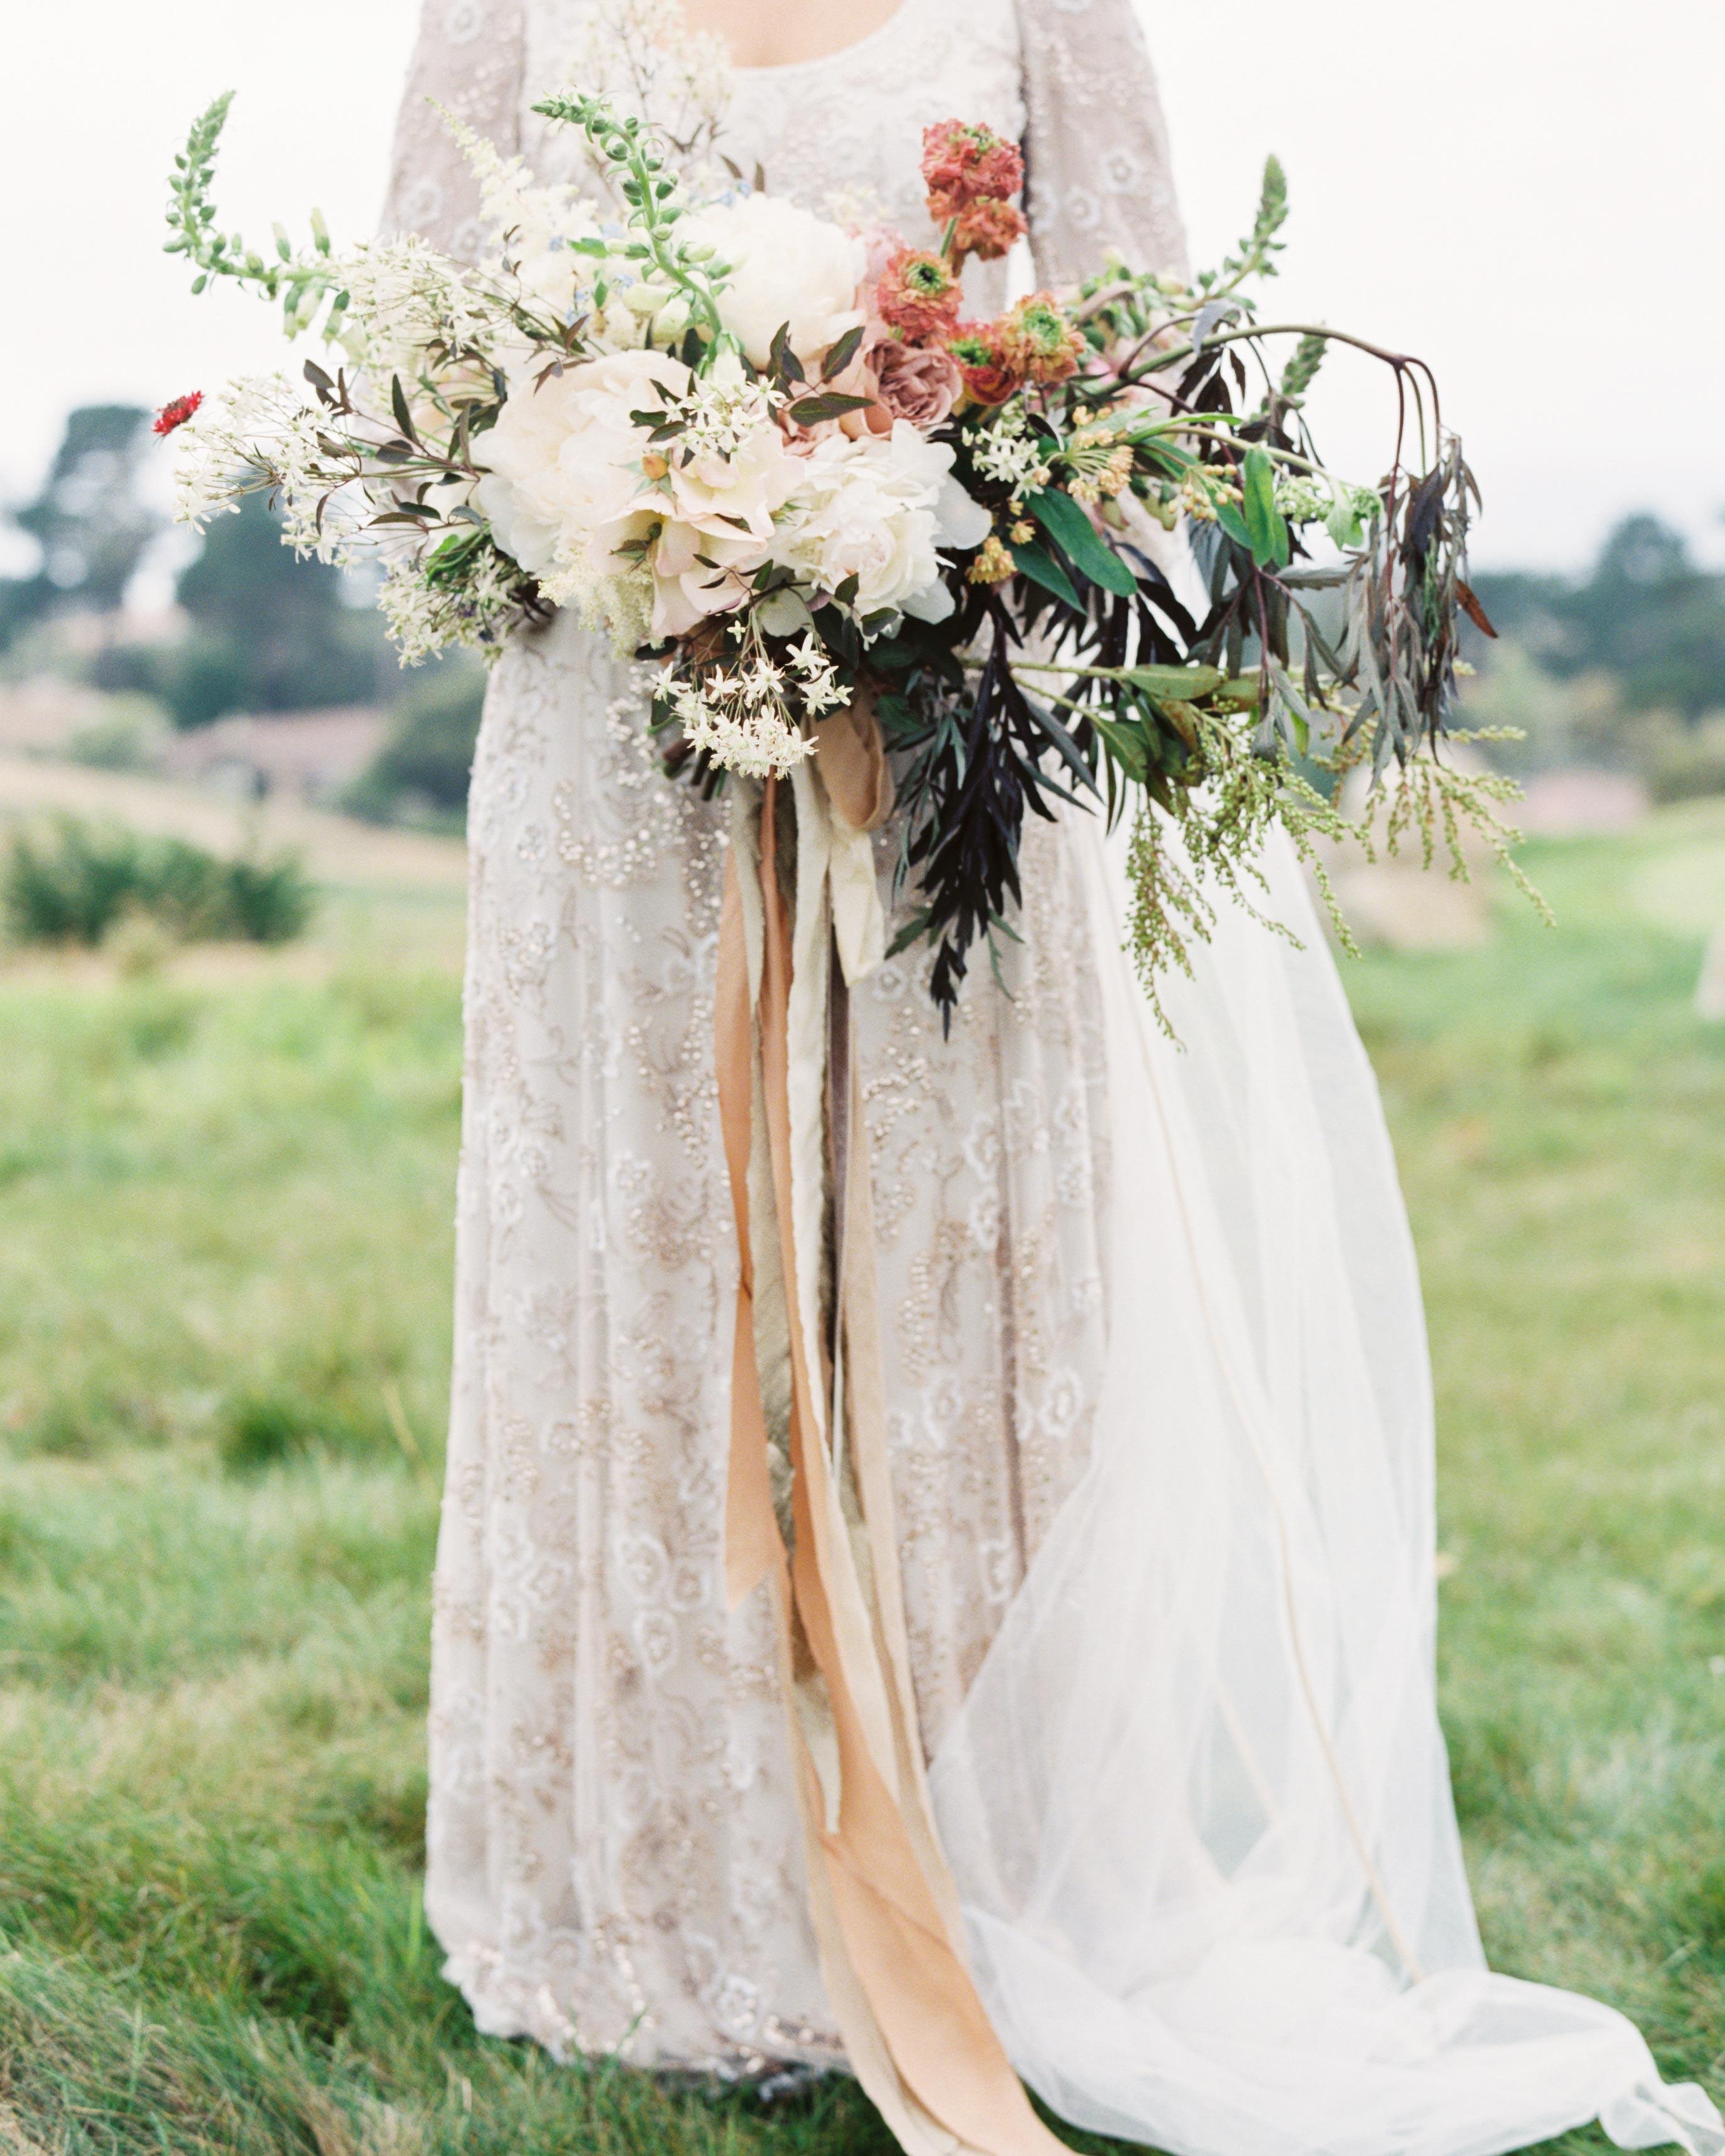 ginny-andrew-wedding-bouquet-0427-s112676-0216.jpg